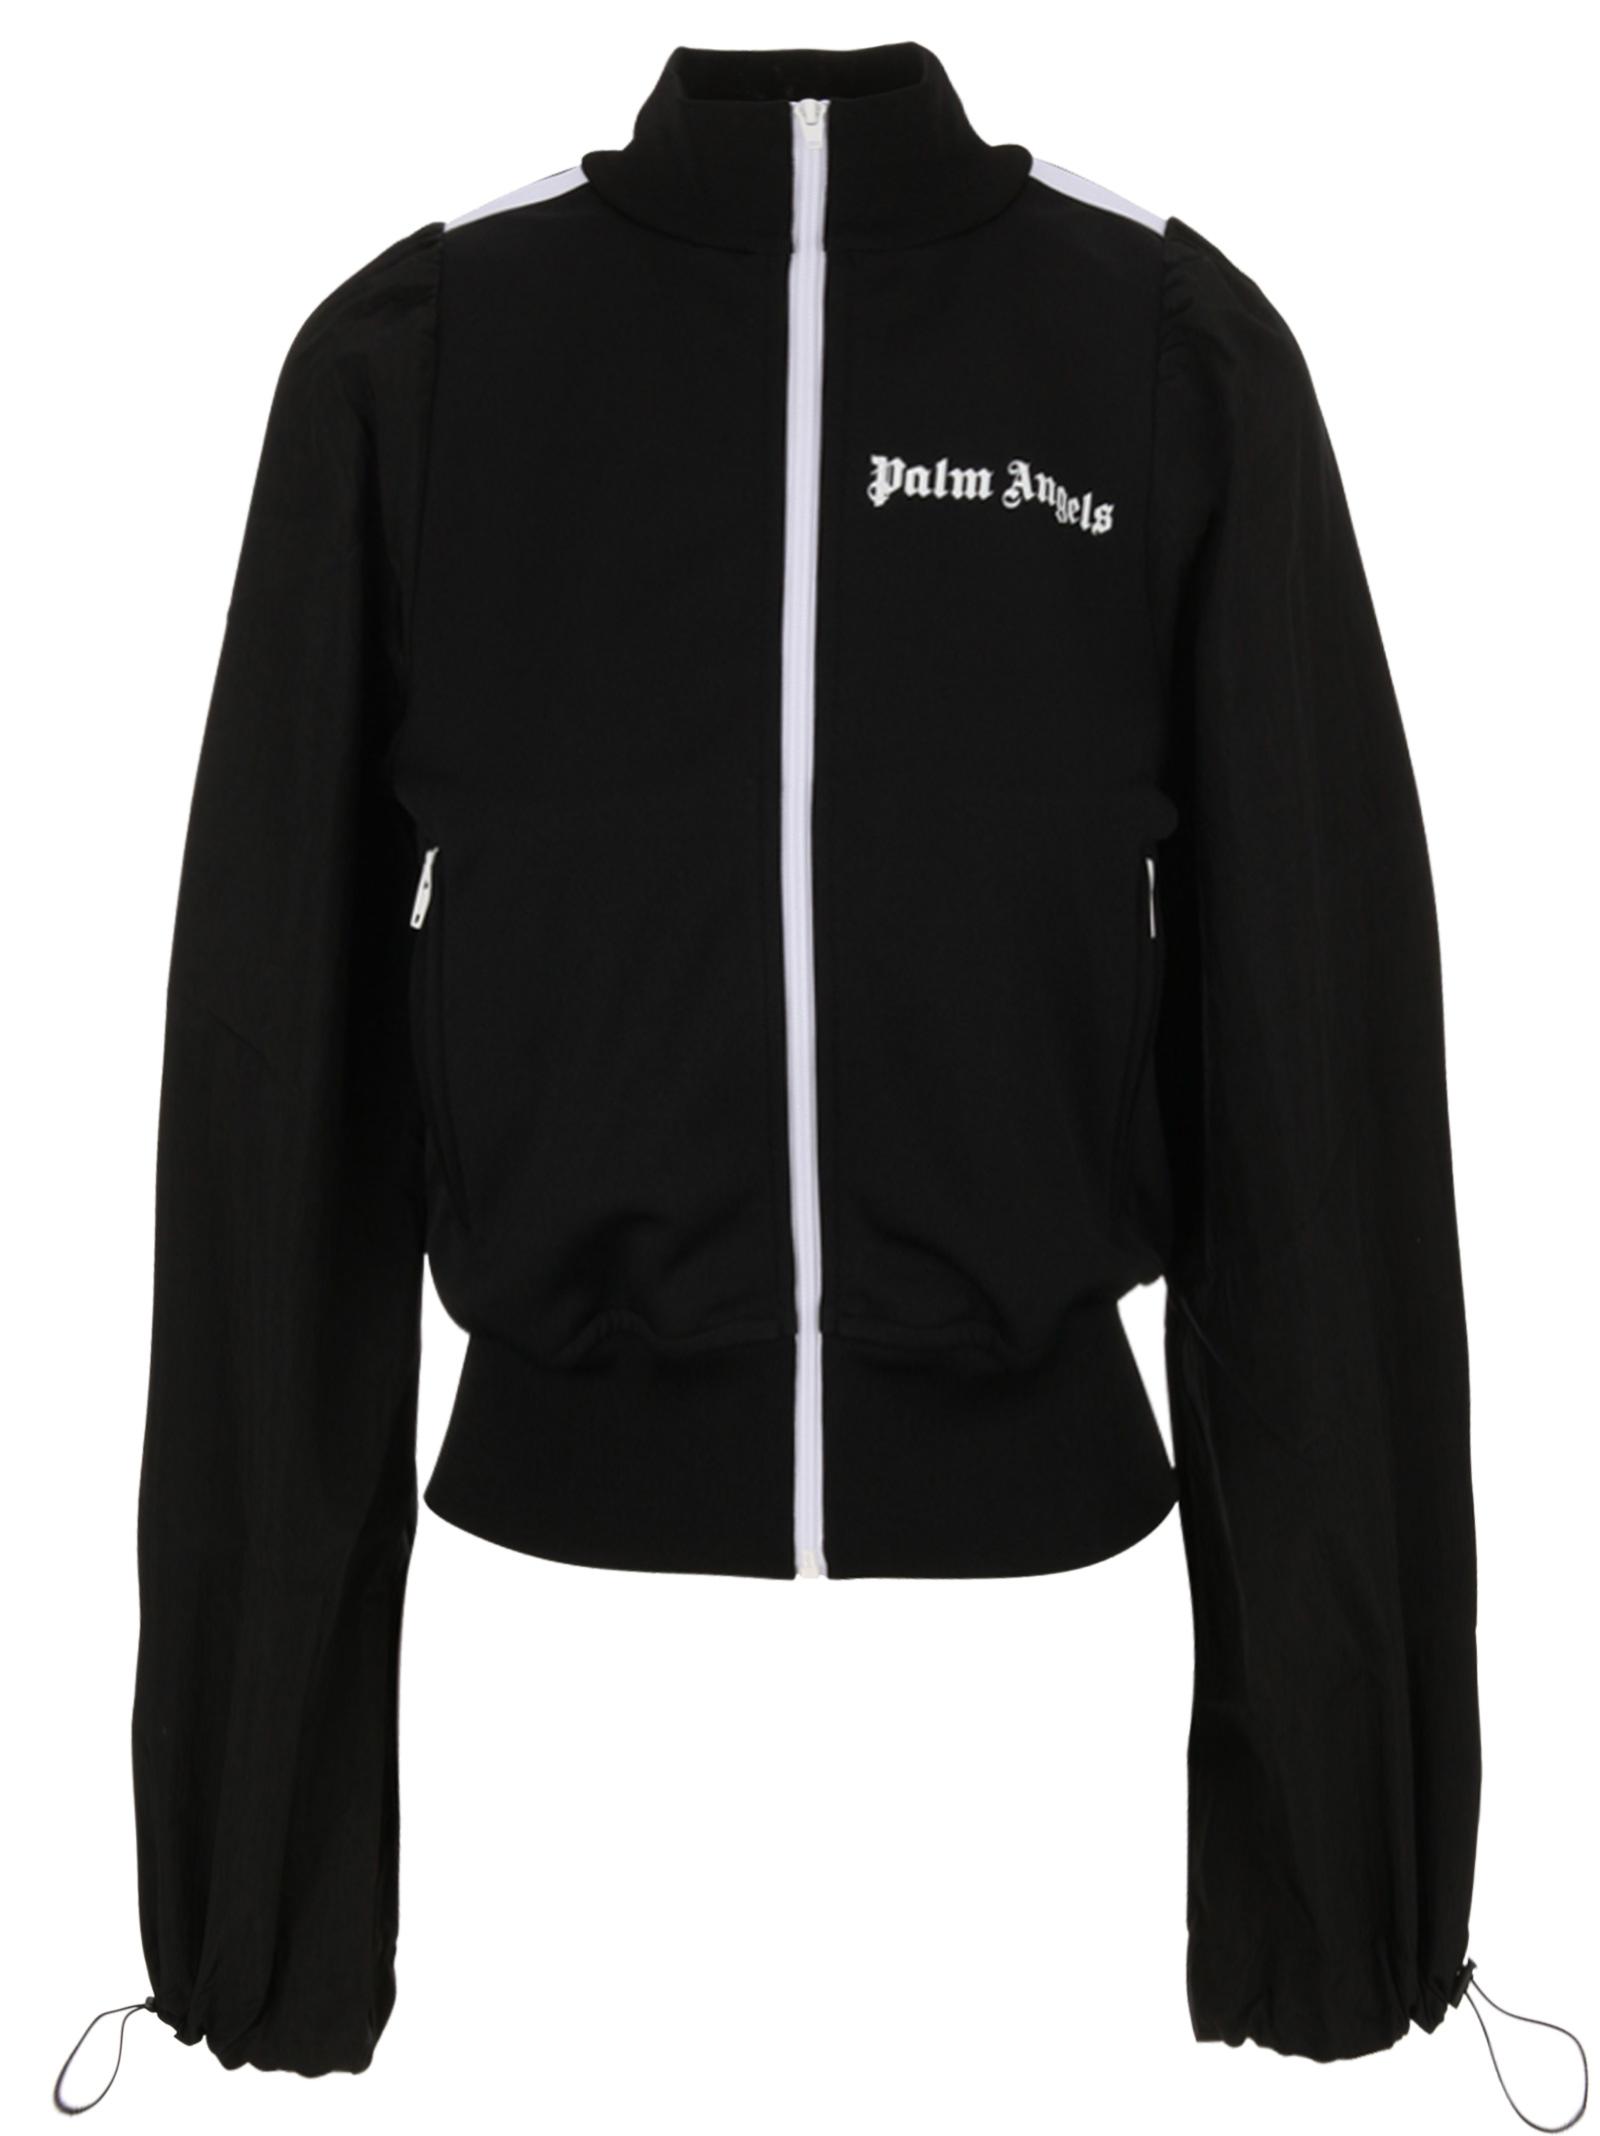 518e2f702f Palm Angels jacket - Palm Angels - Michele Franzese Moda